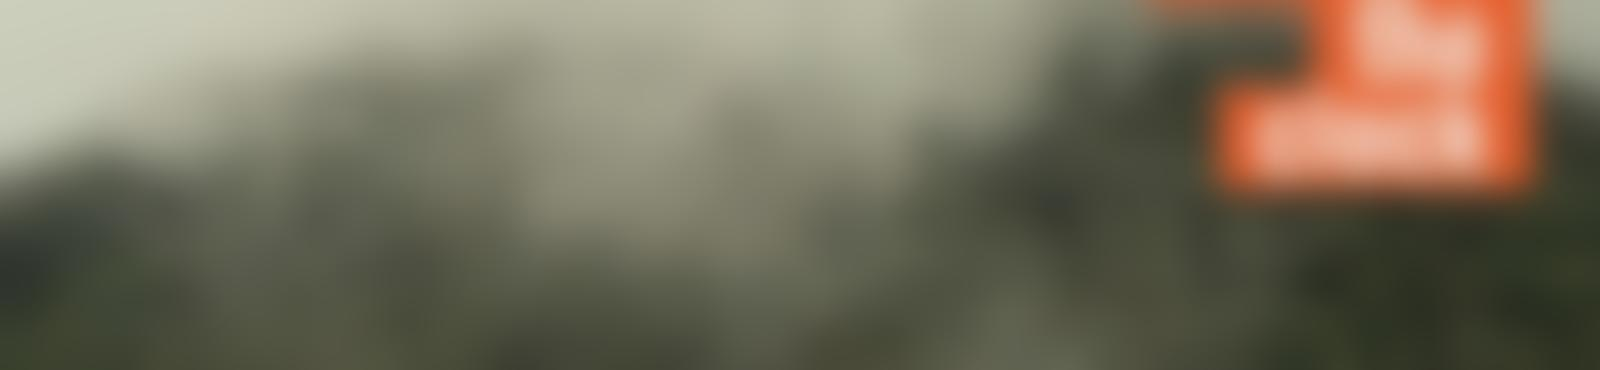 Blurred 67ab4ac3 192d 4984 b39b 449cfa19338a